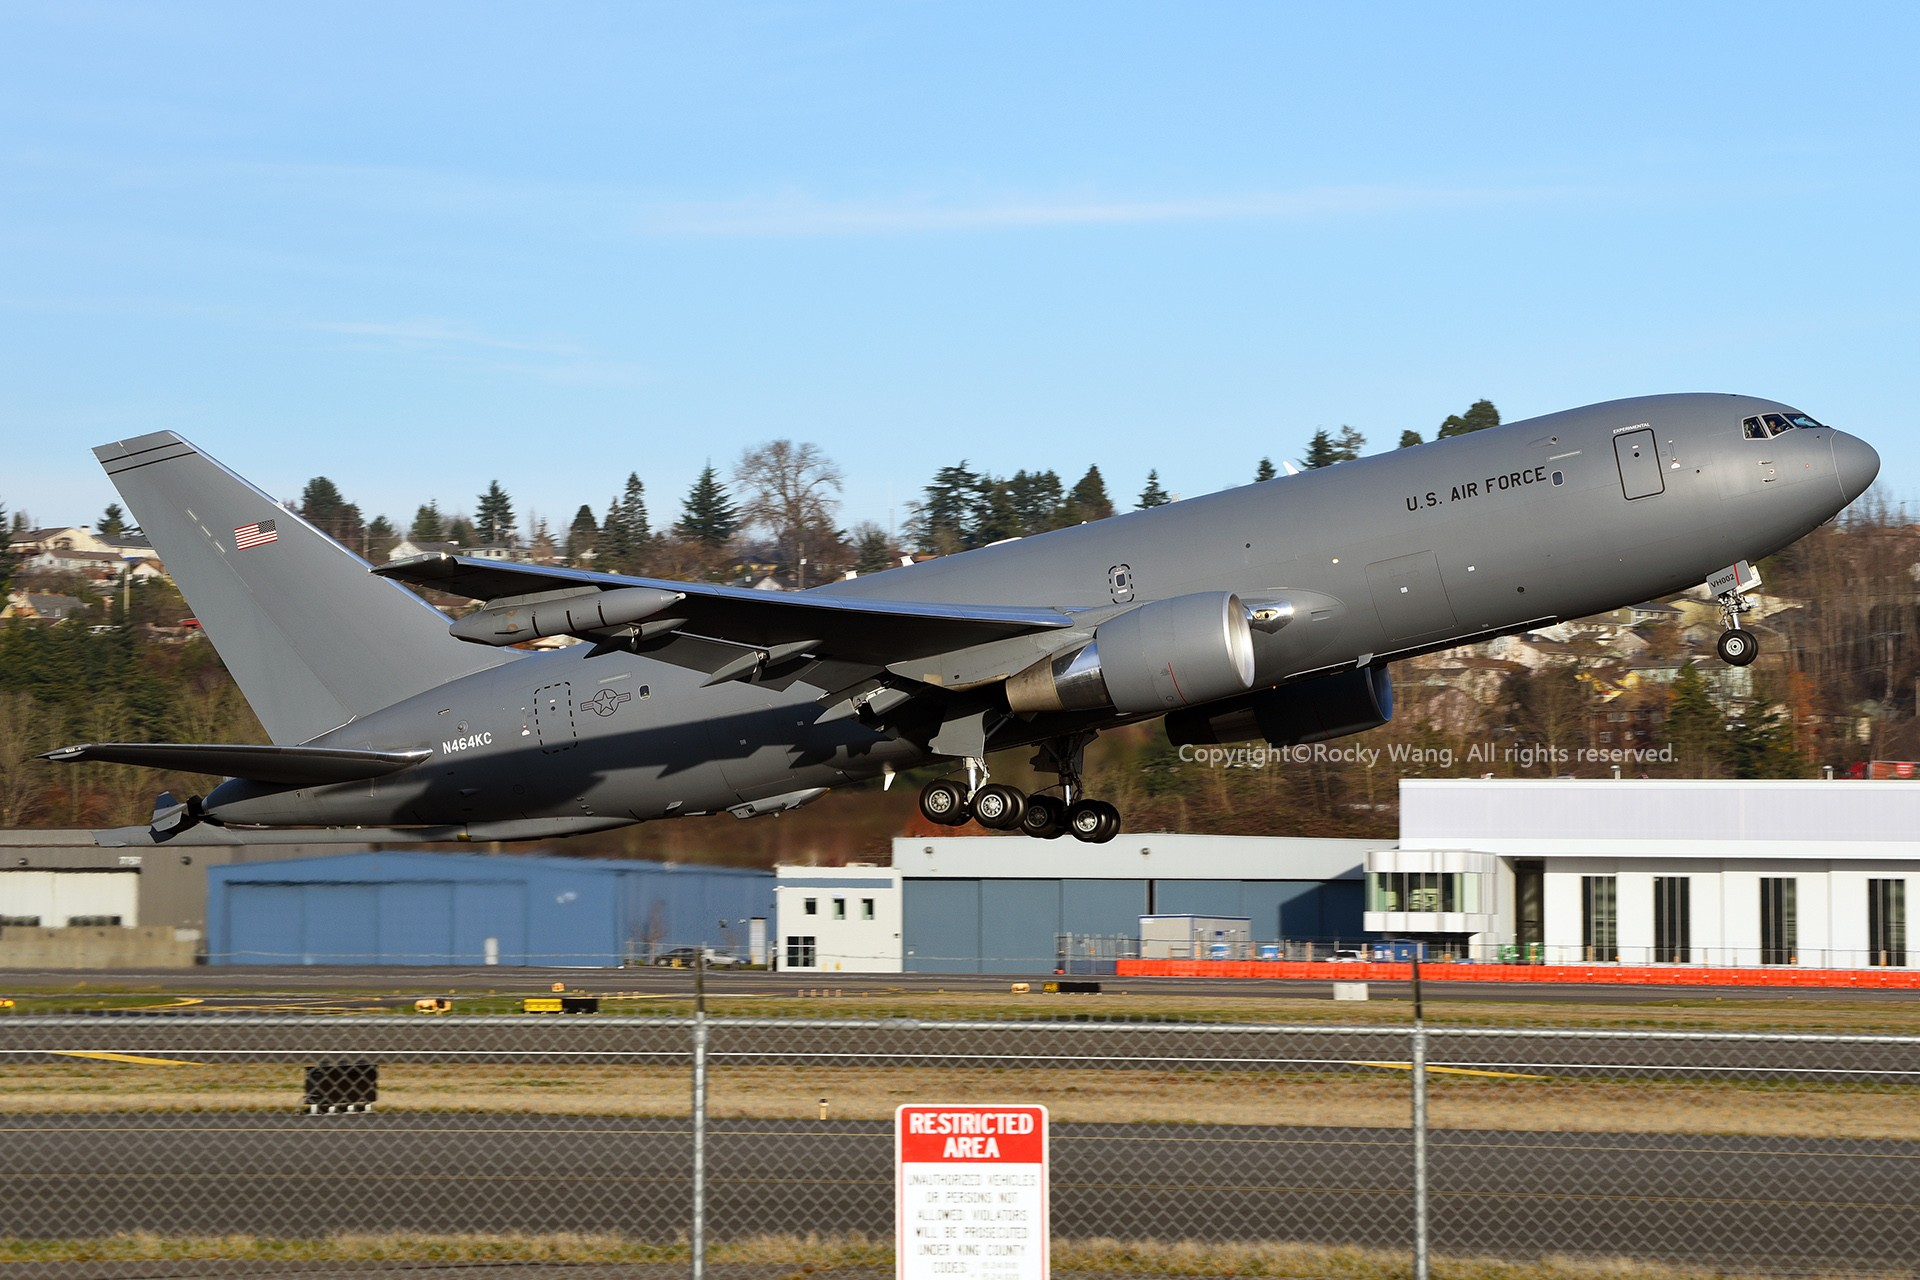 Re:[原创]Seattle 30图 BOEING KC-46A PEGASUS N464KC Seattle Boeing Field/King County